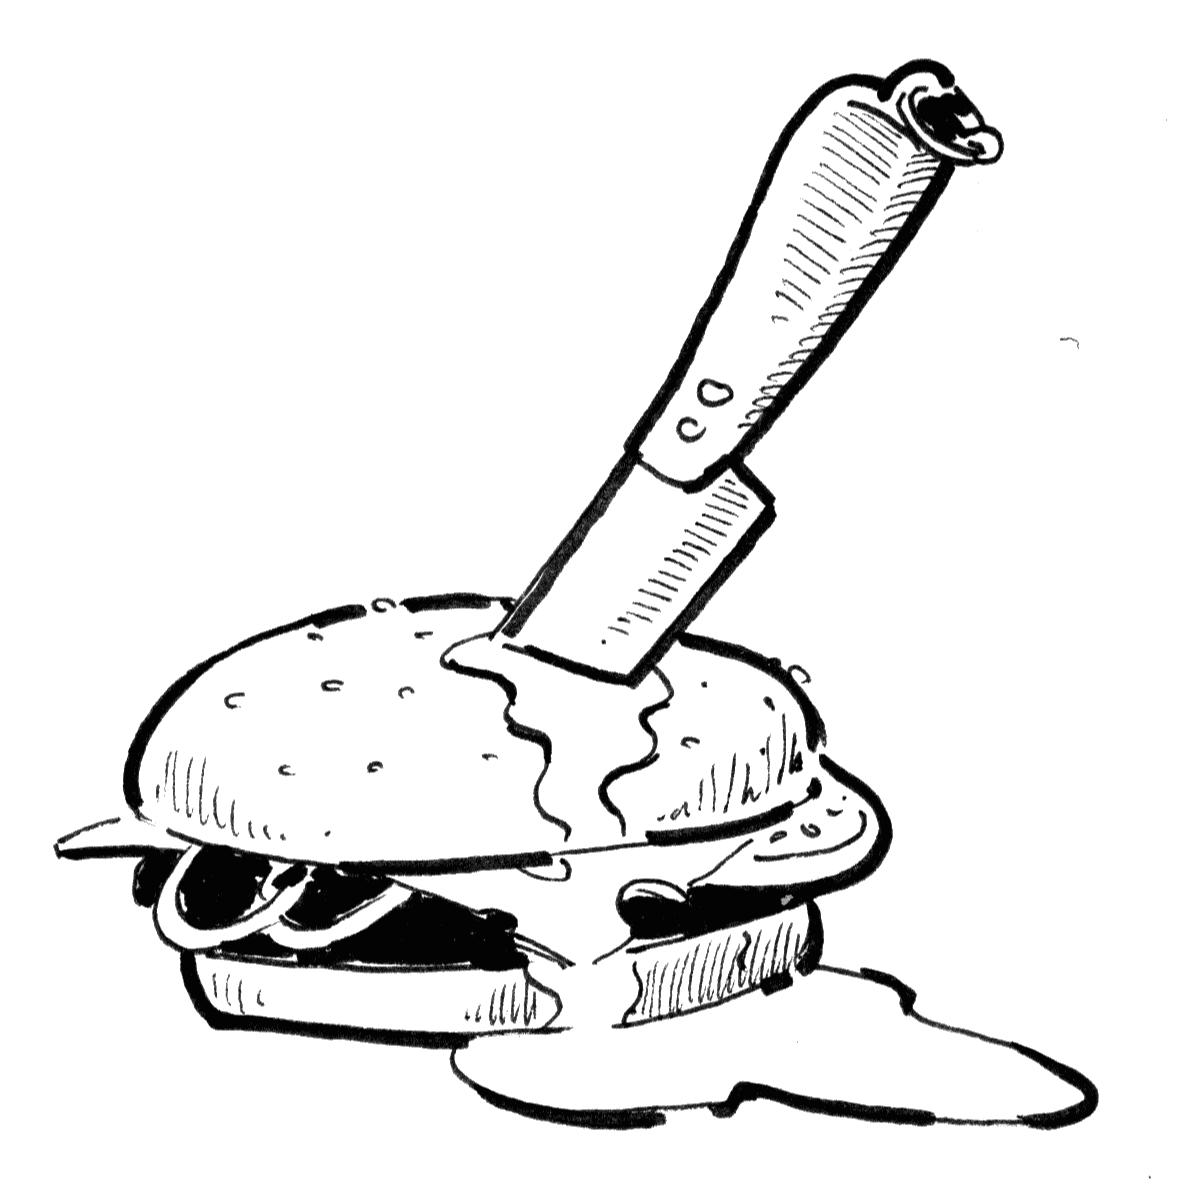 13-vignette-food-menu-hardcore-burger.jpg